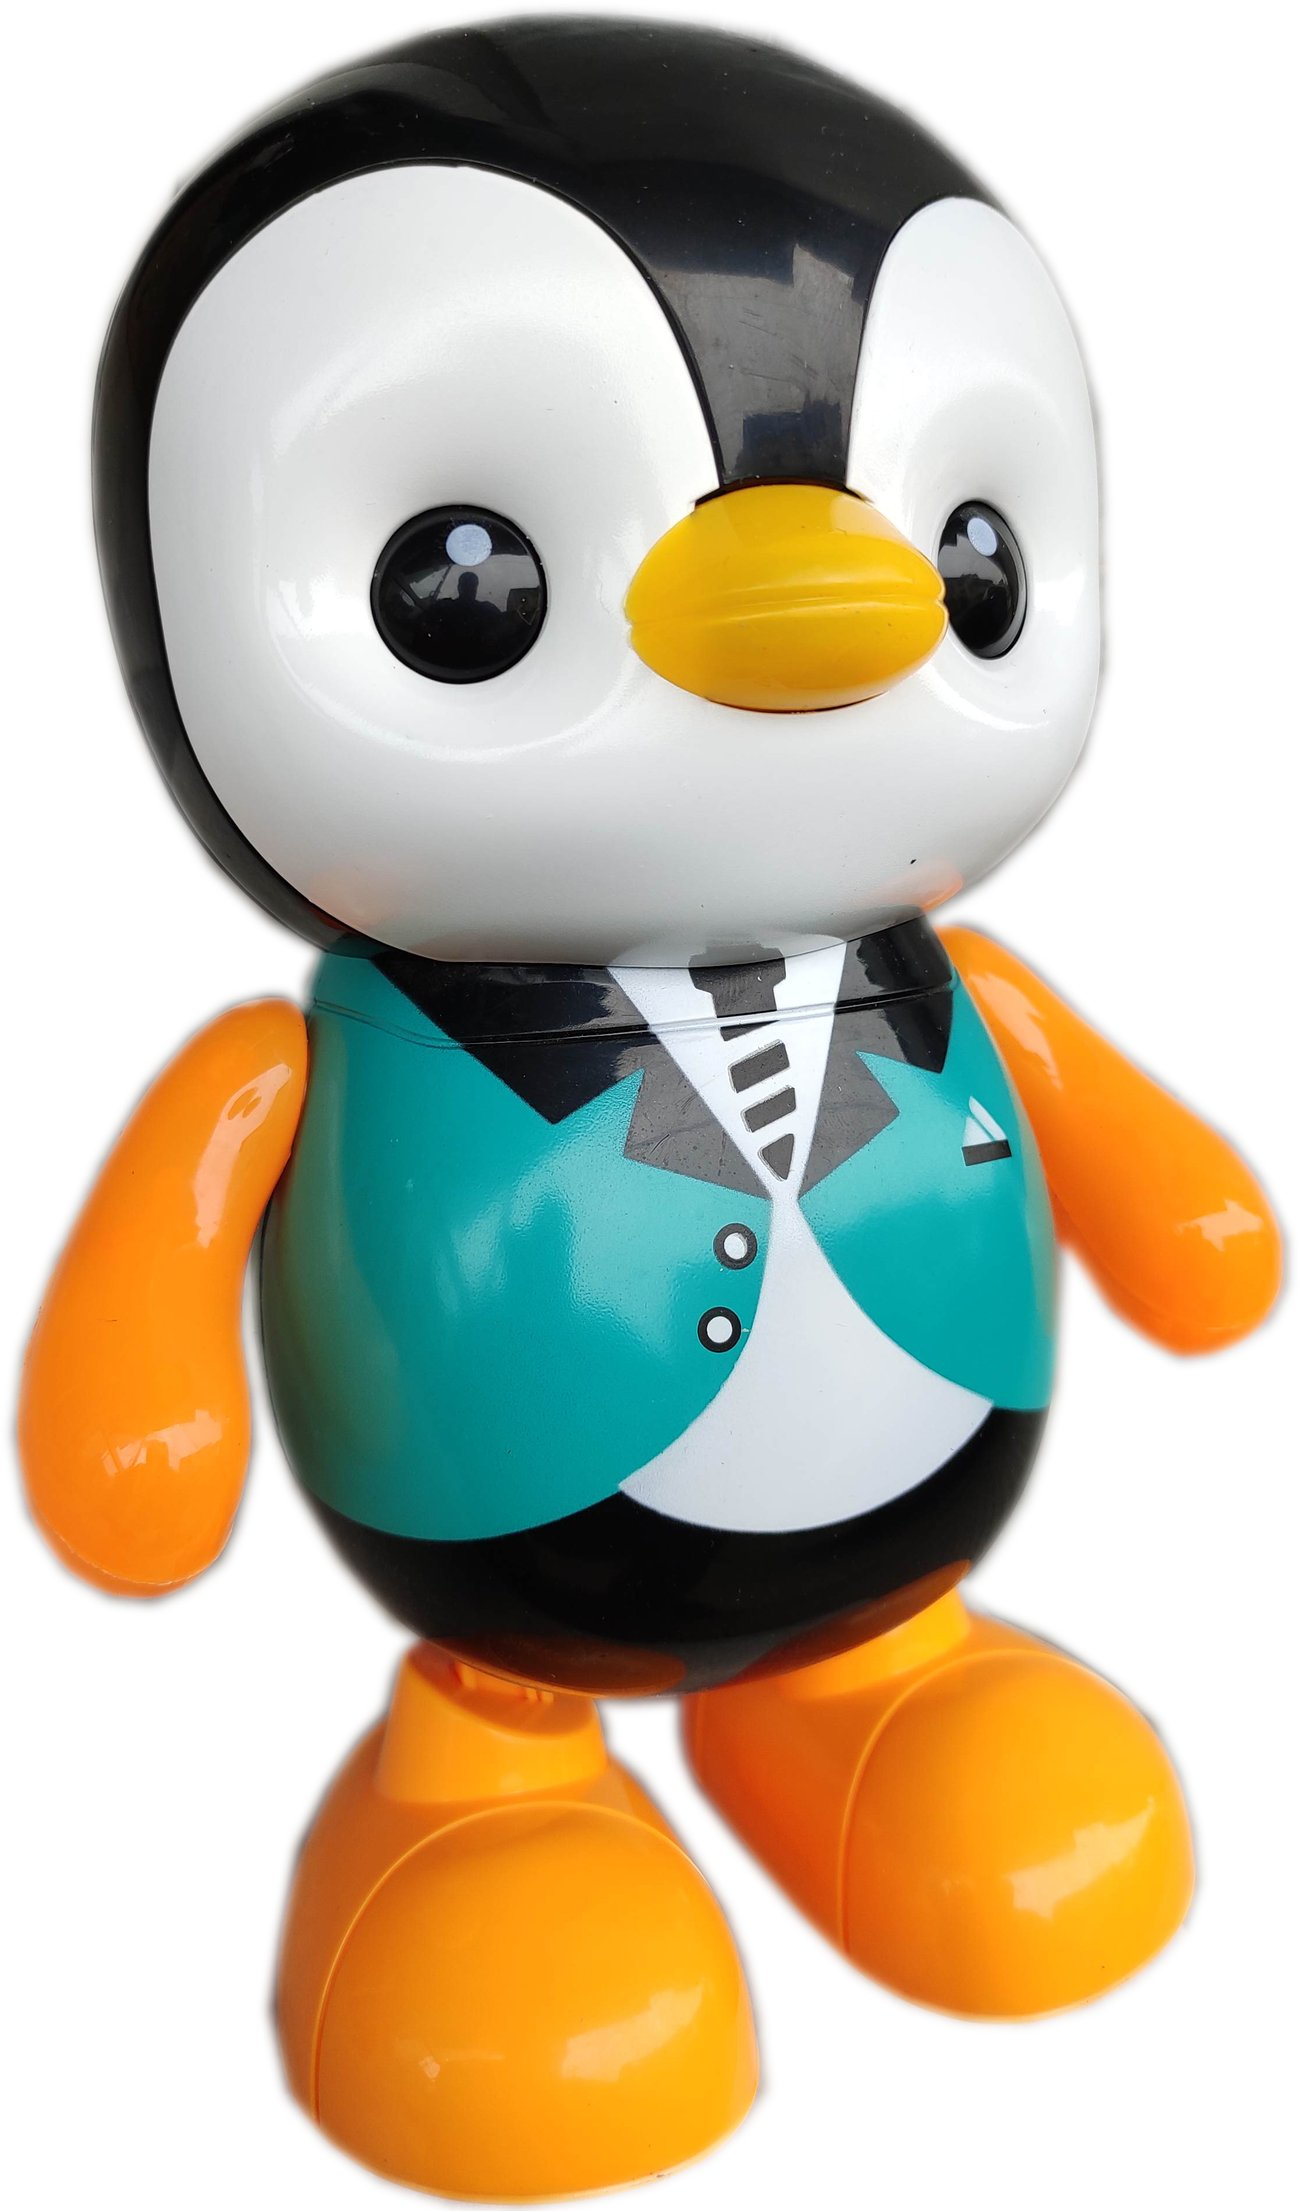 Детска занимателна играчка Танцуващ Пингвин със светлина и звук